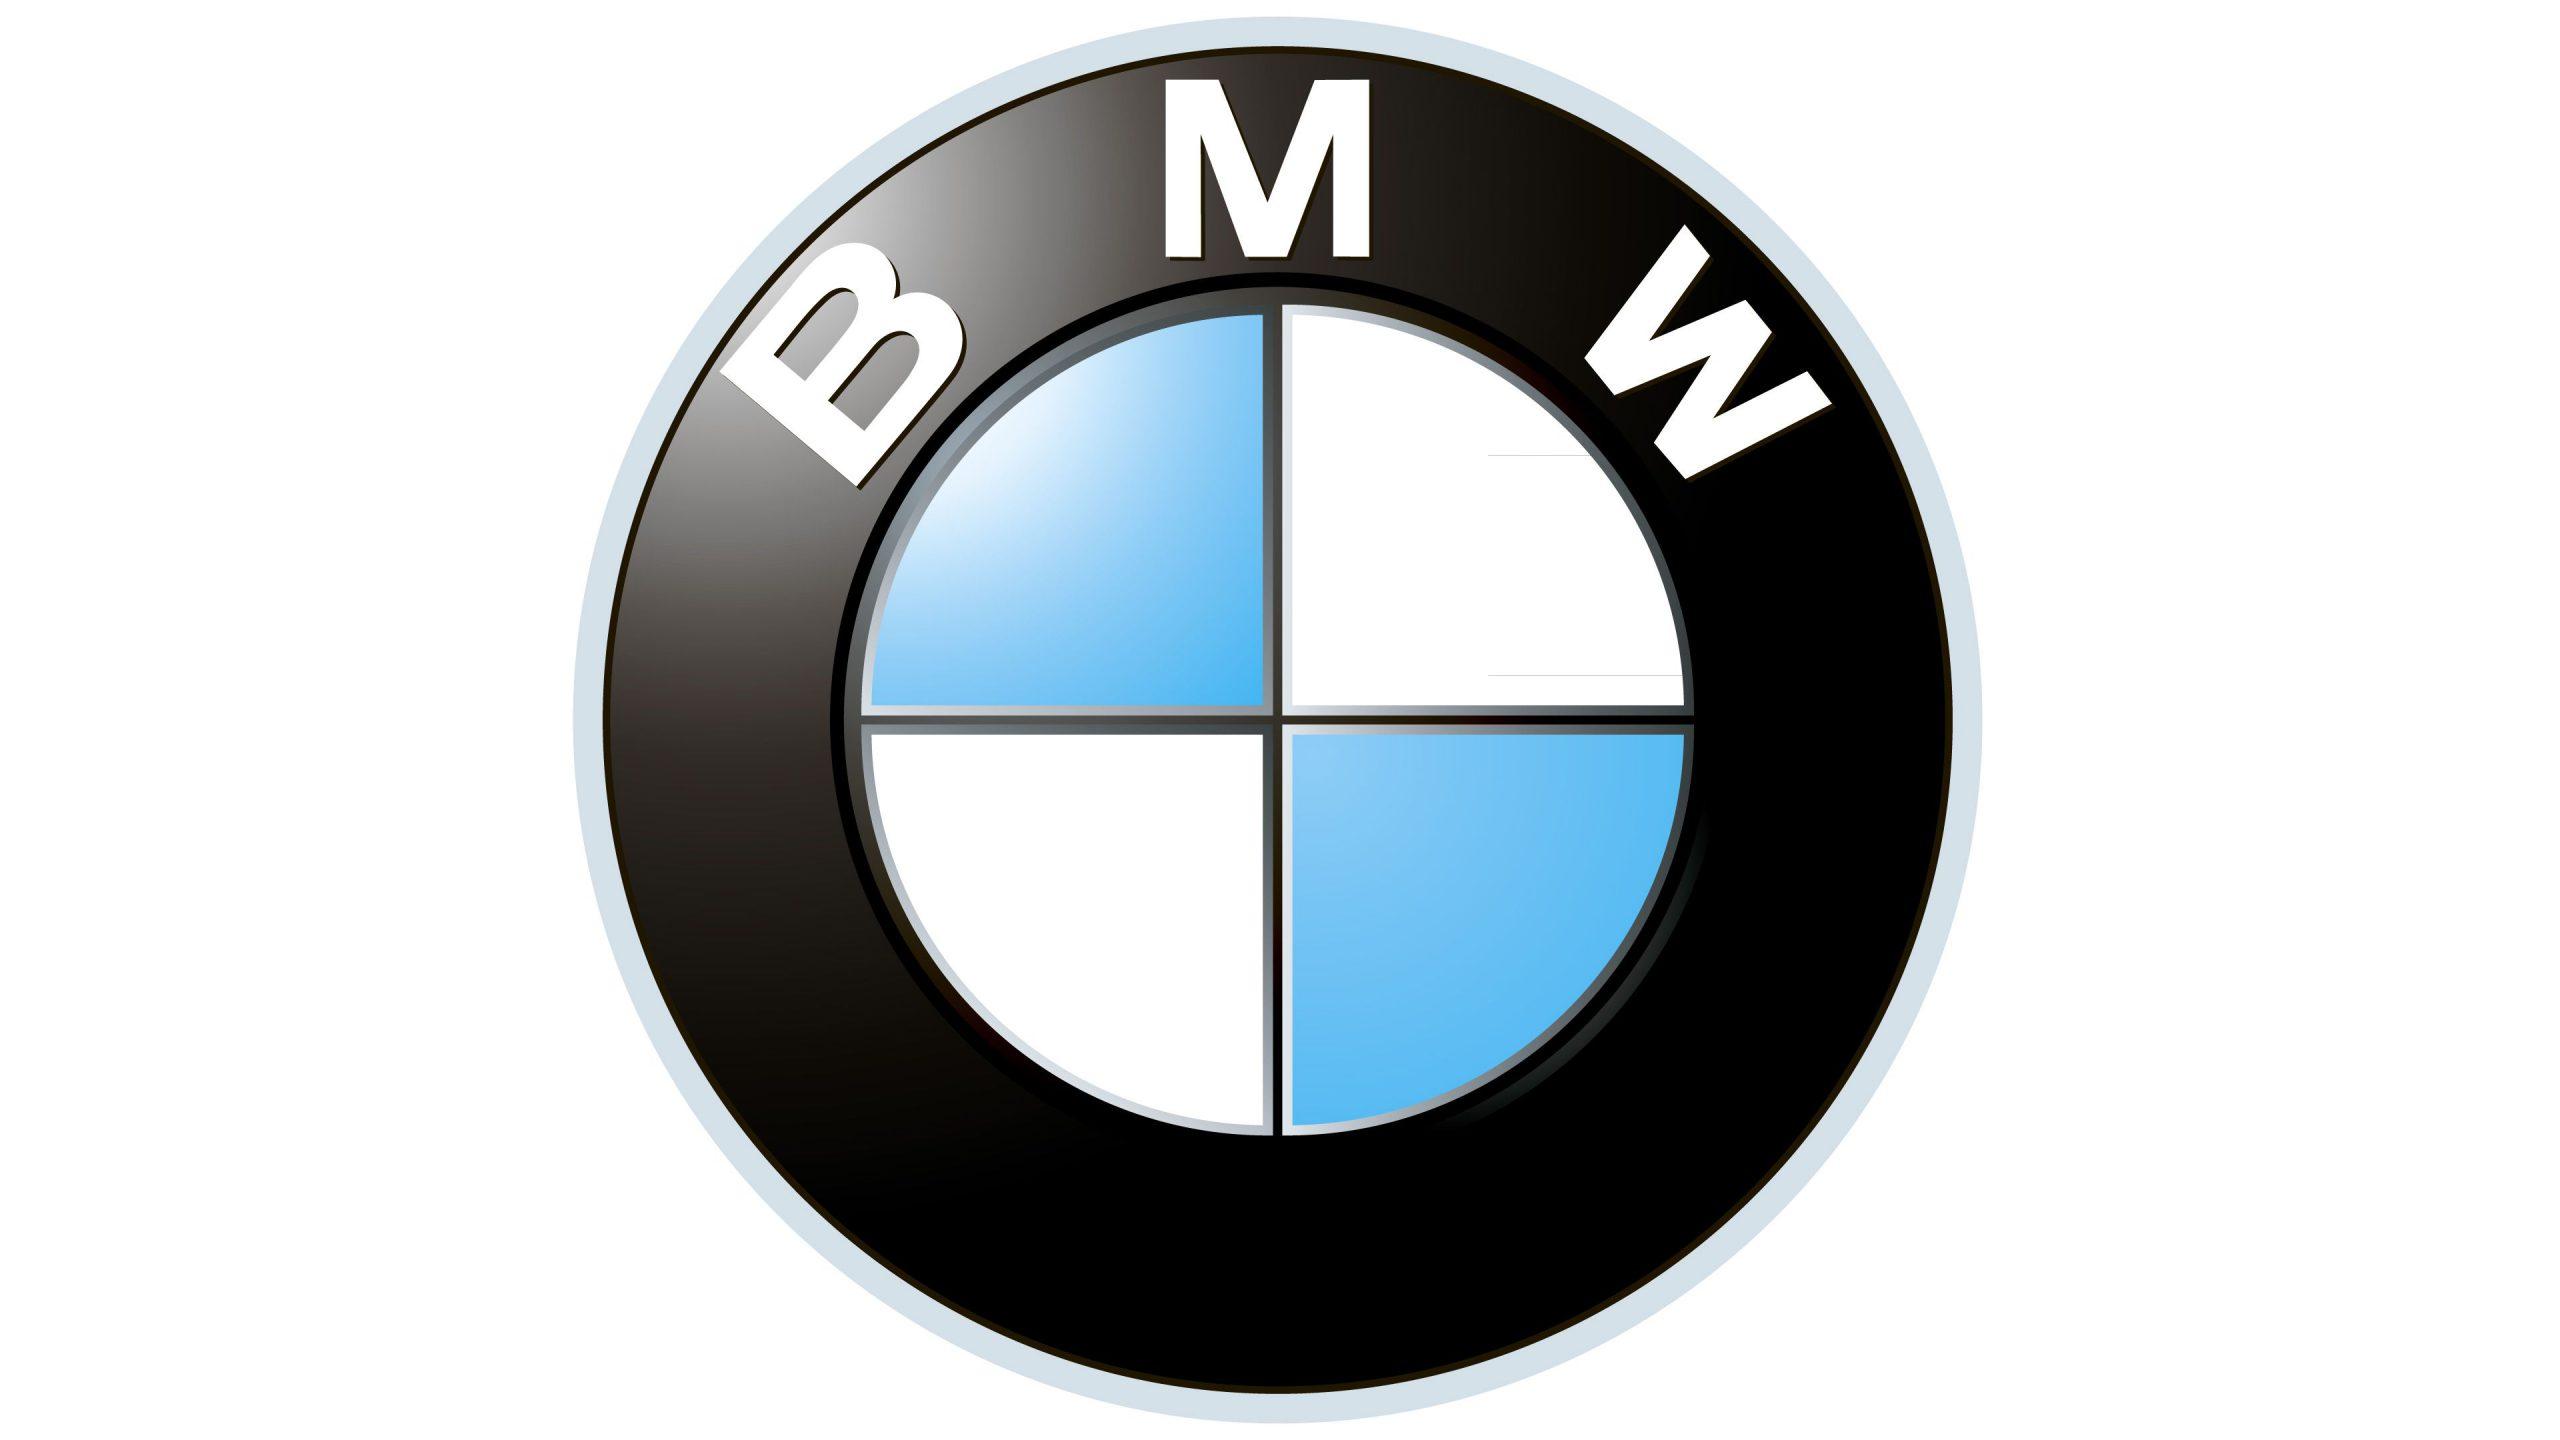 bmw logo vector | Bmw logo, Bmw, Logos